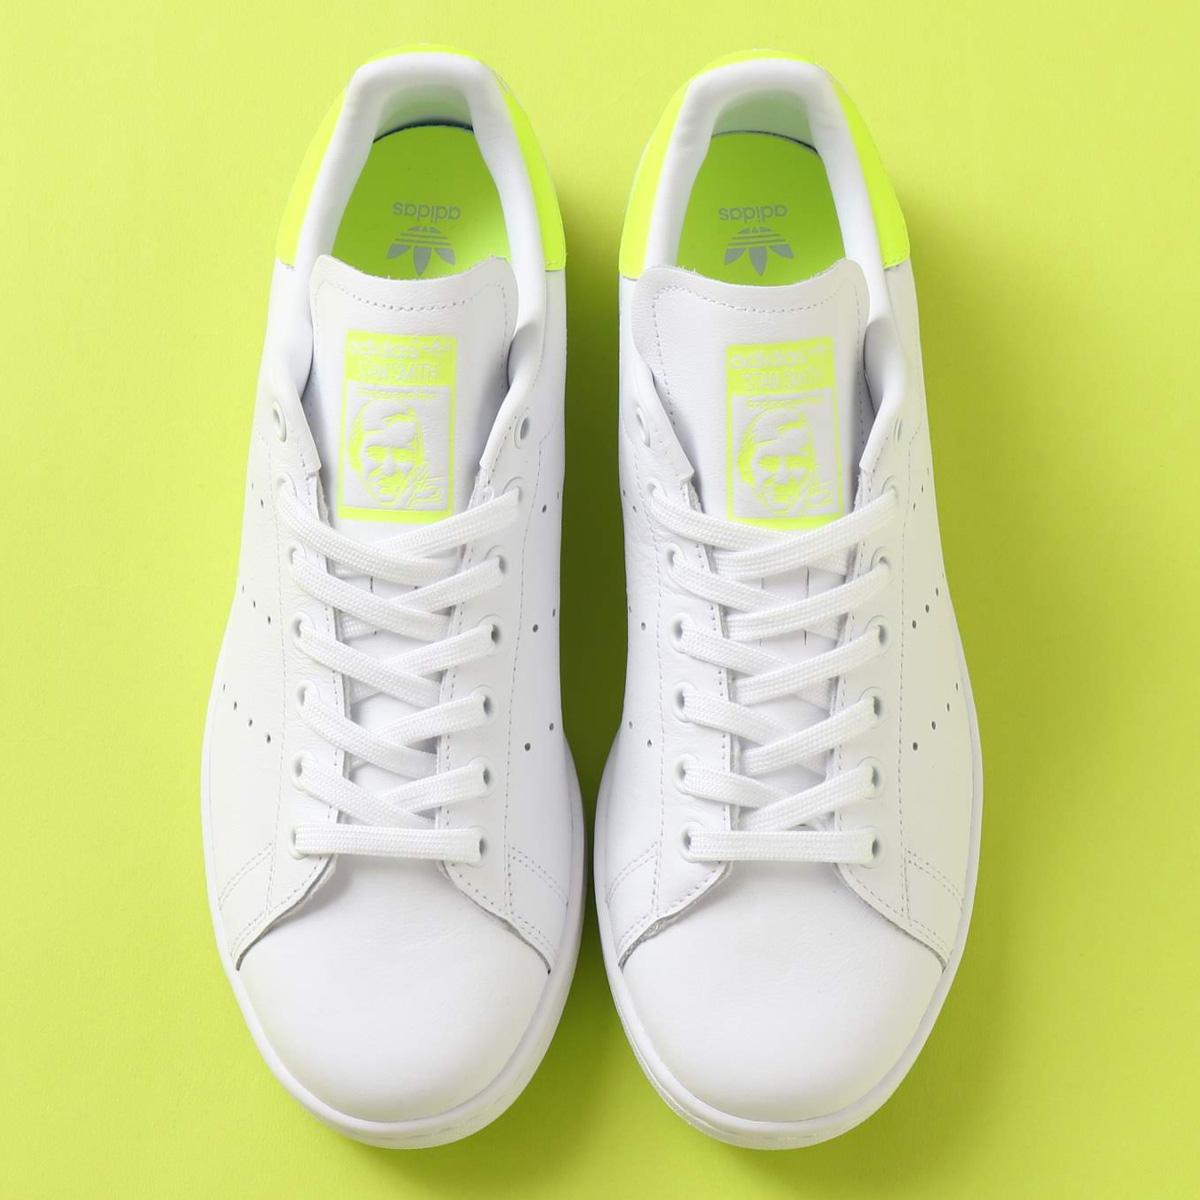 adidas Originals STAN SMITH(アディダスオリジナルス スタンスミス)RUNNING WHITE/SOLAR YELLOW/RUNNING WHITE【メンズ レディース スニーカー】19FW-I